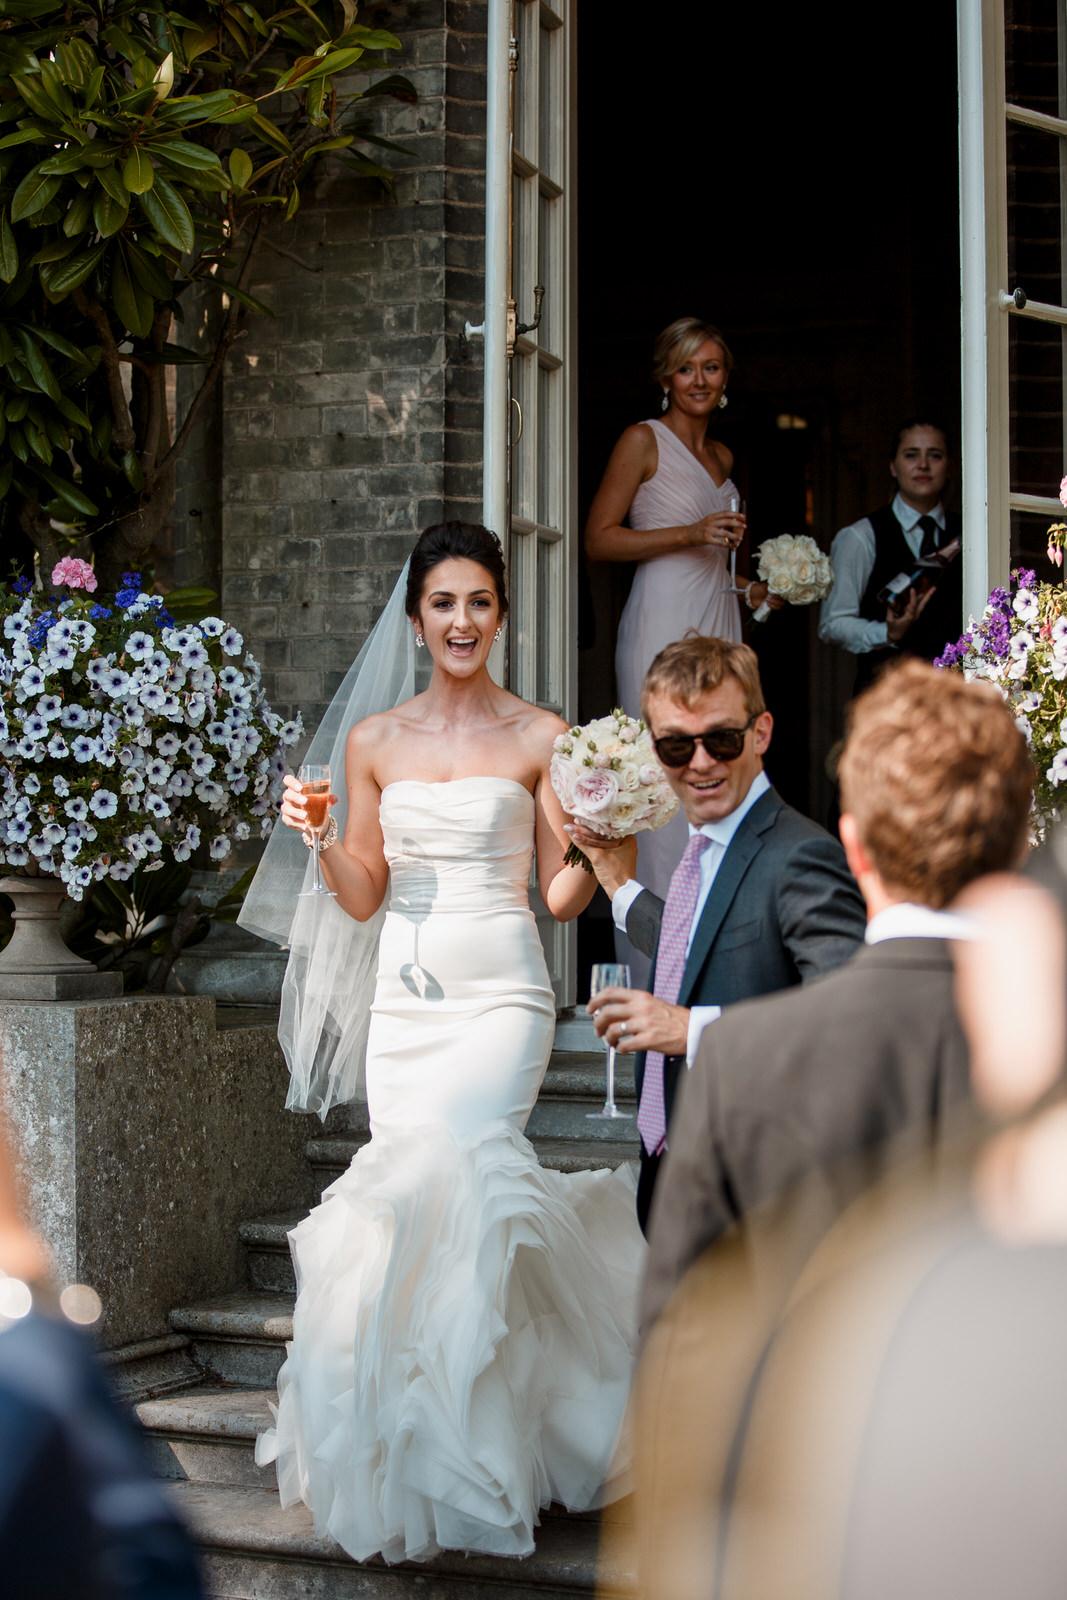 Home counties wedding photography by Damion Mower on English-Wedding.com (24)